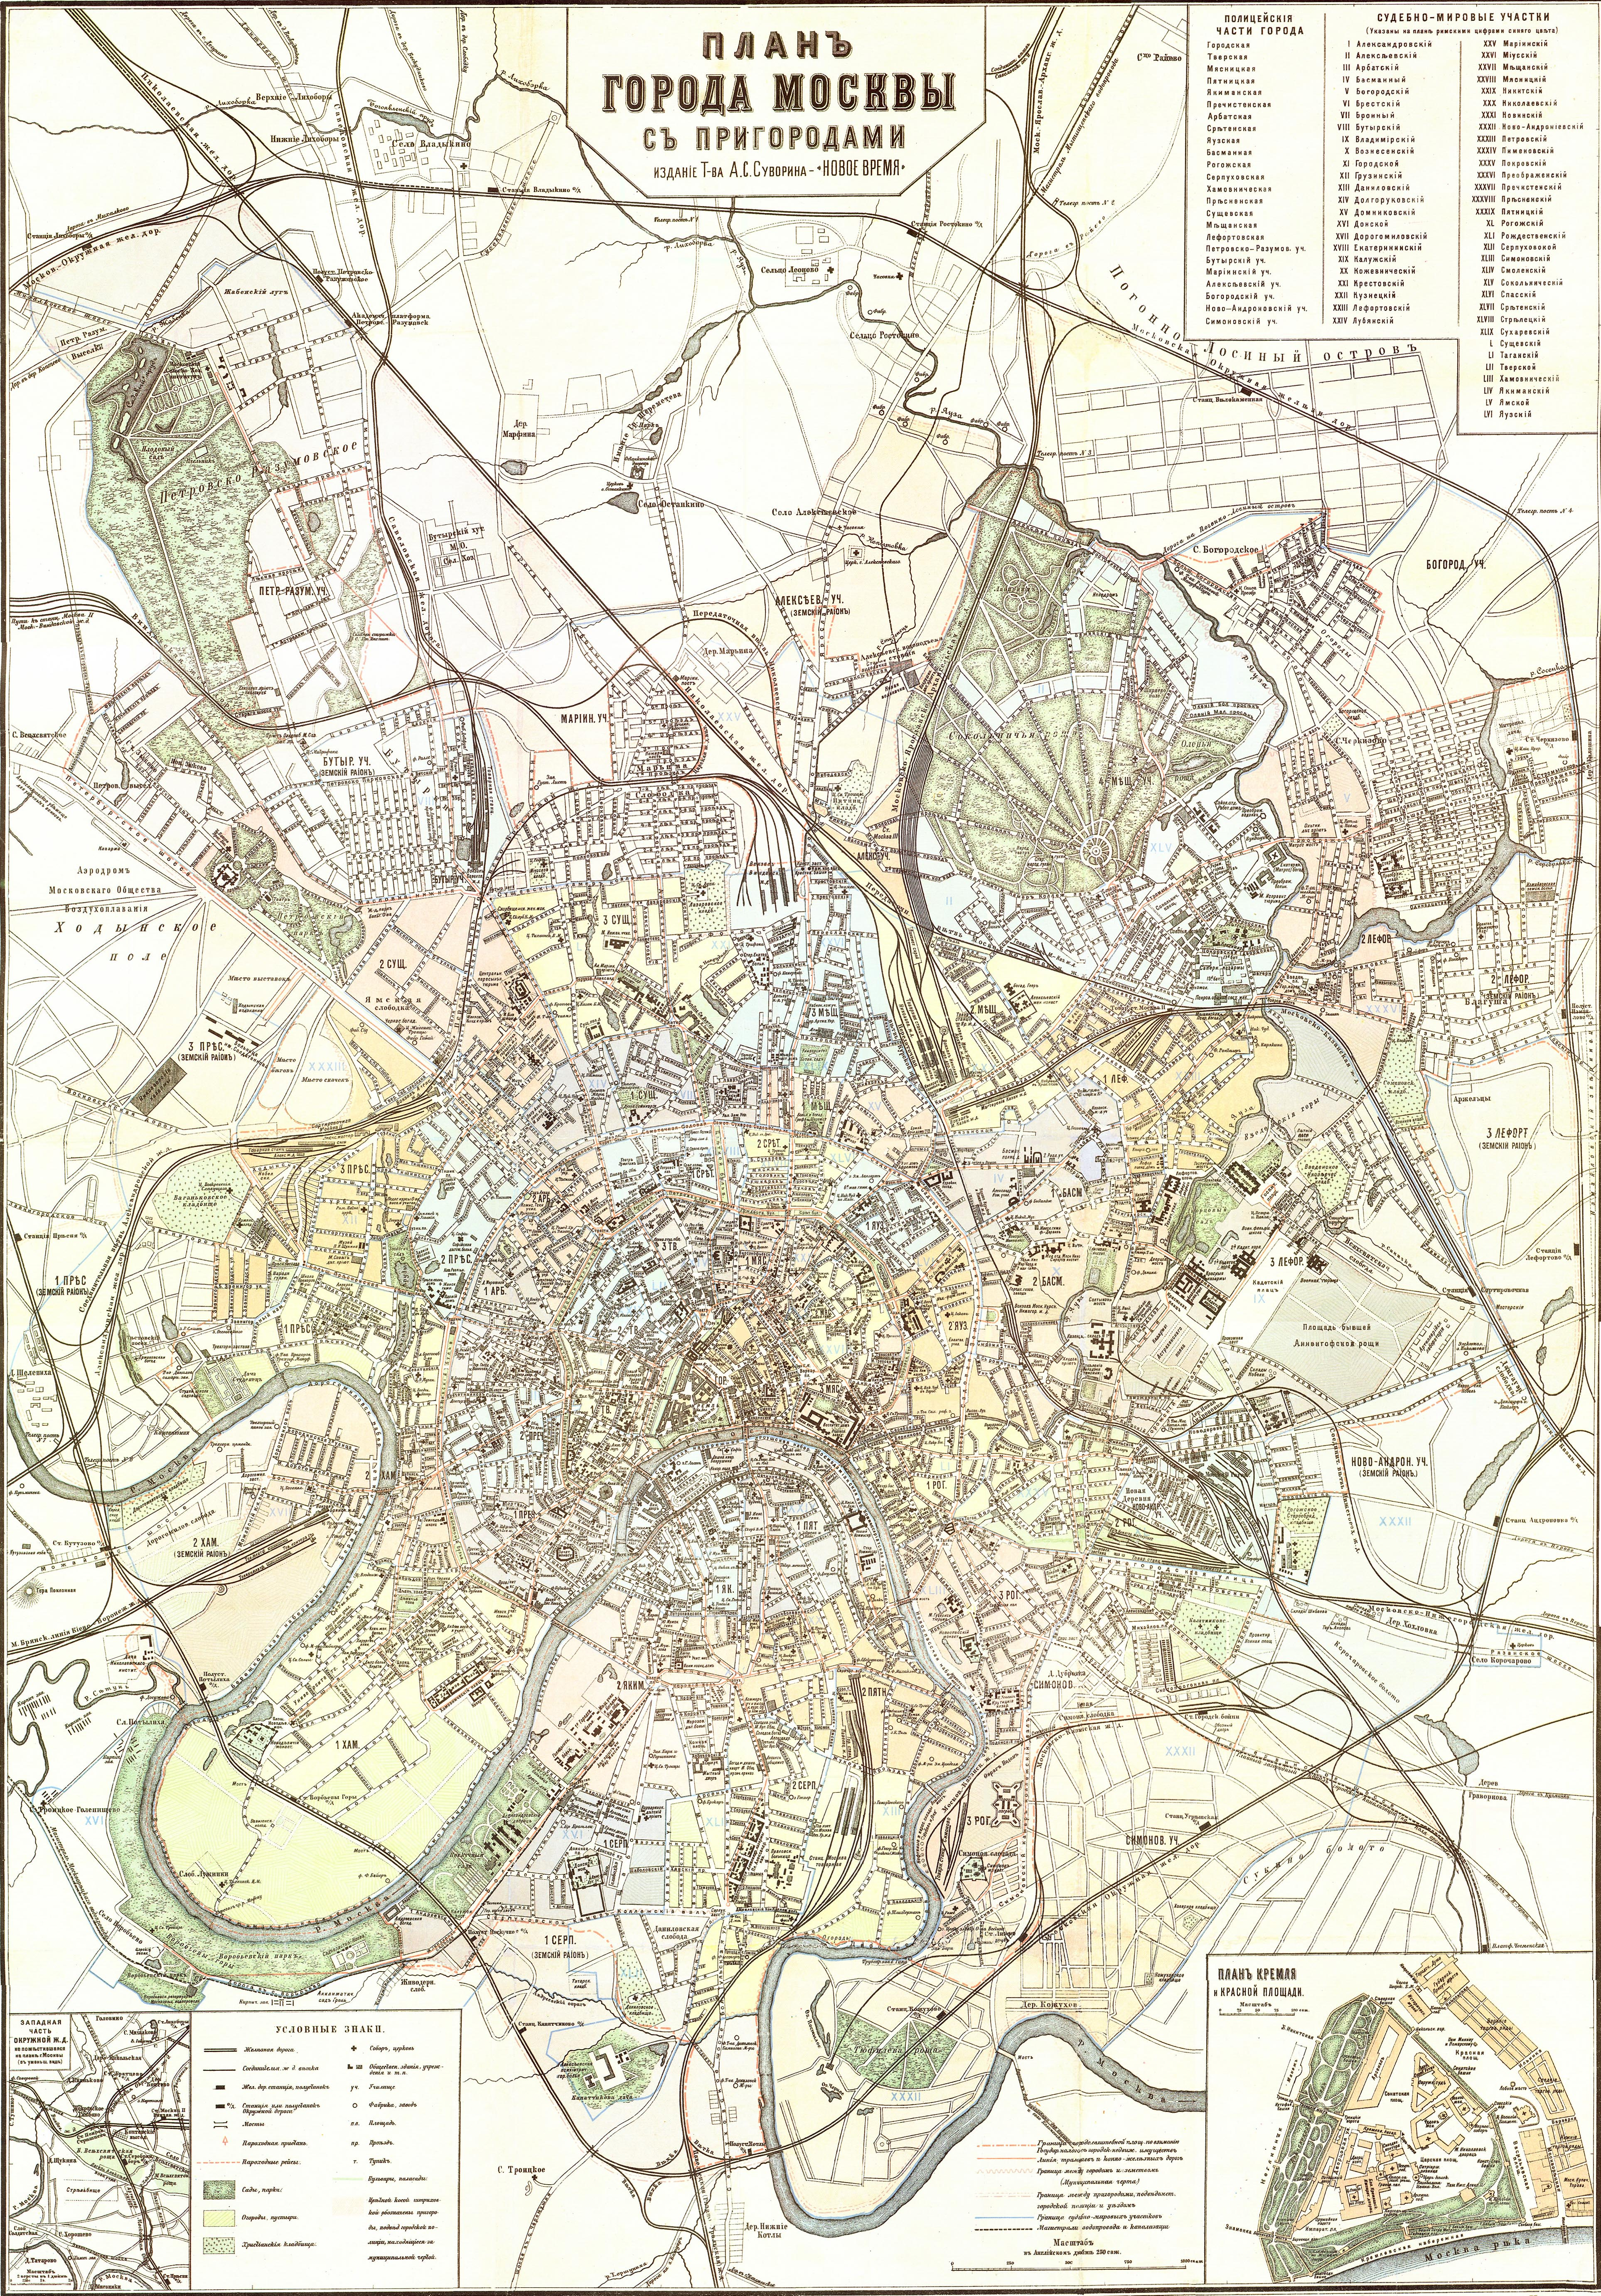 Карта москвы 1907 года 8720 12540 13 5 мб